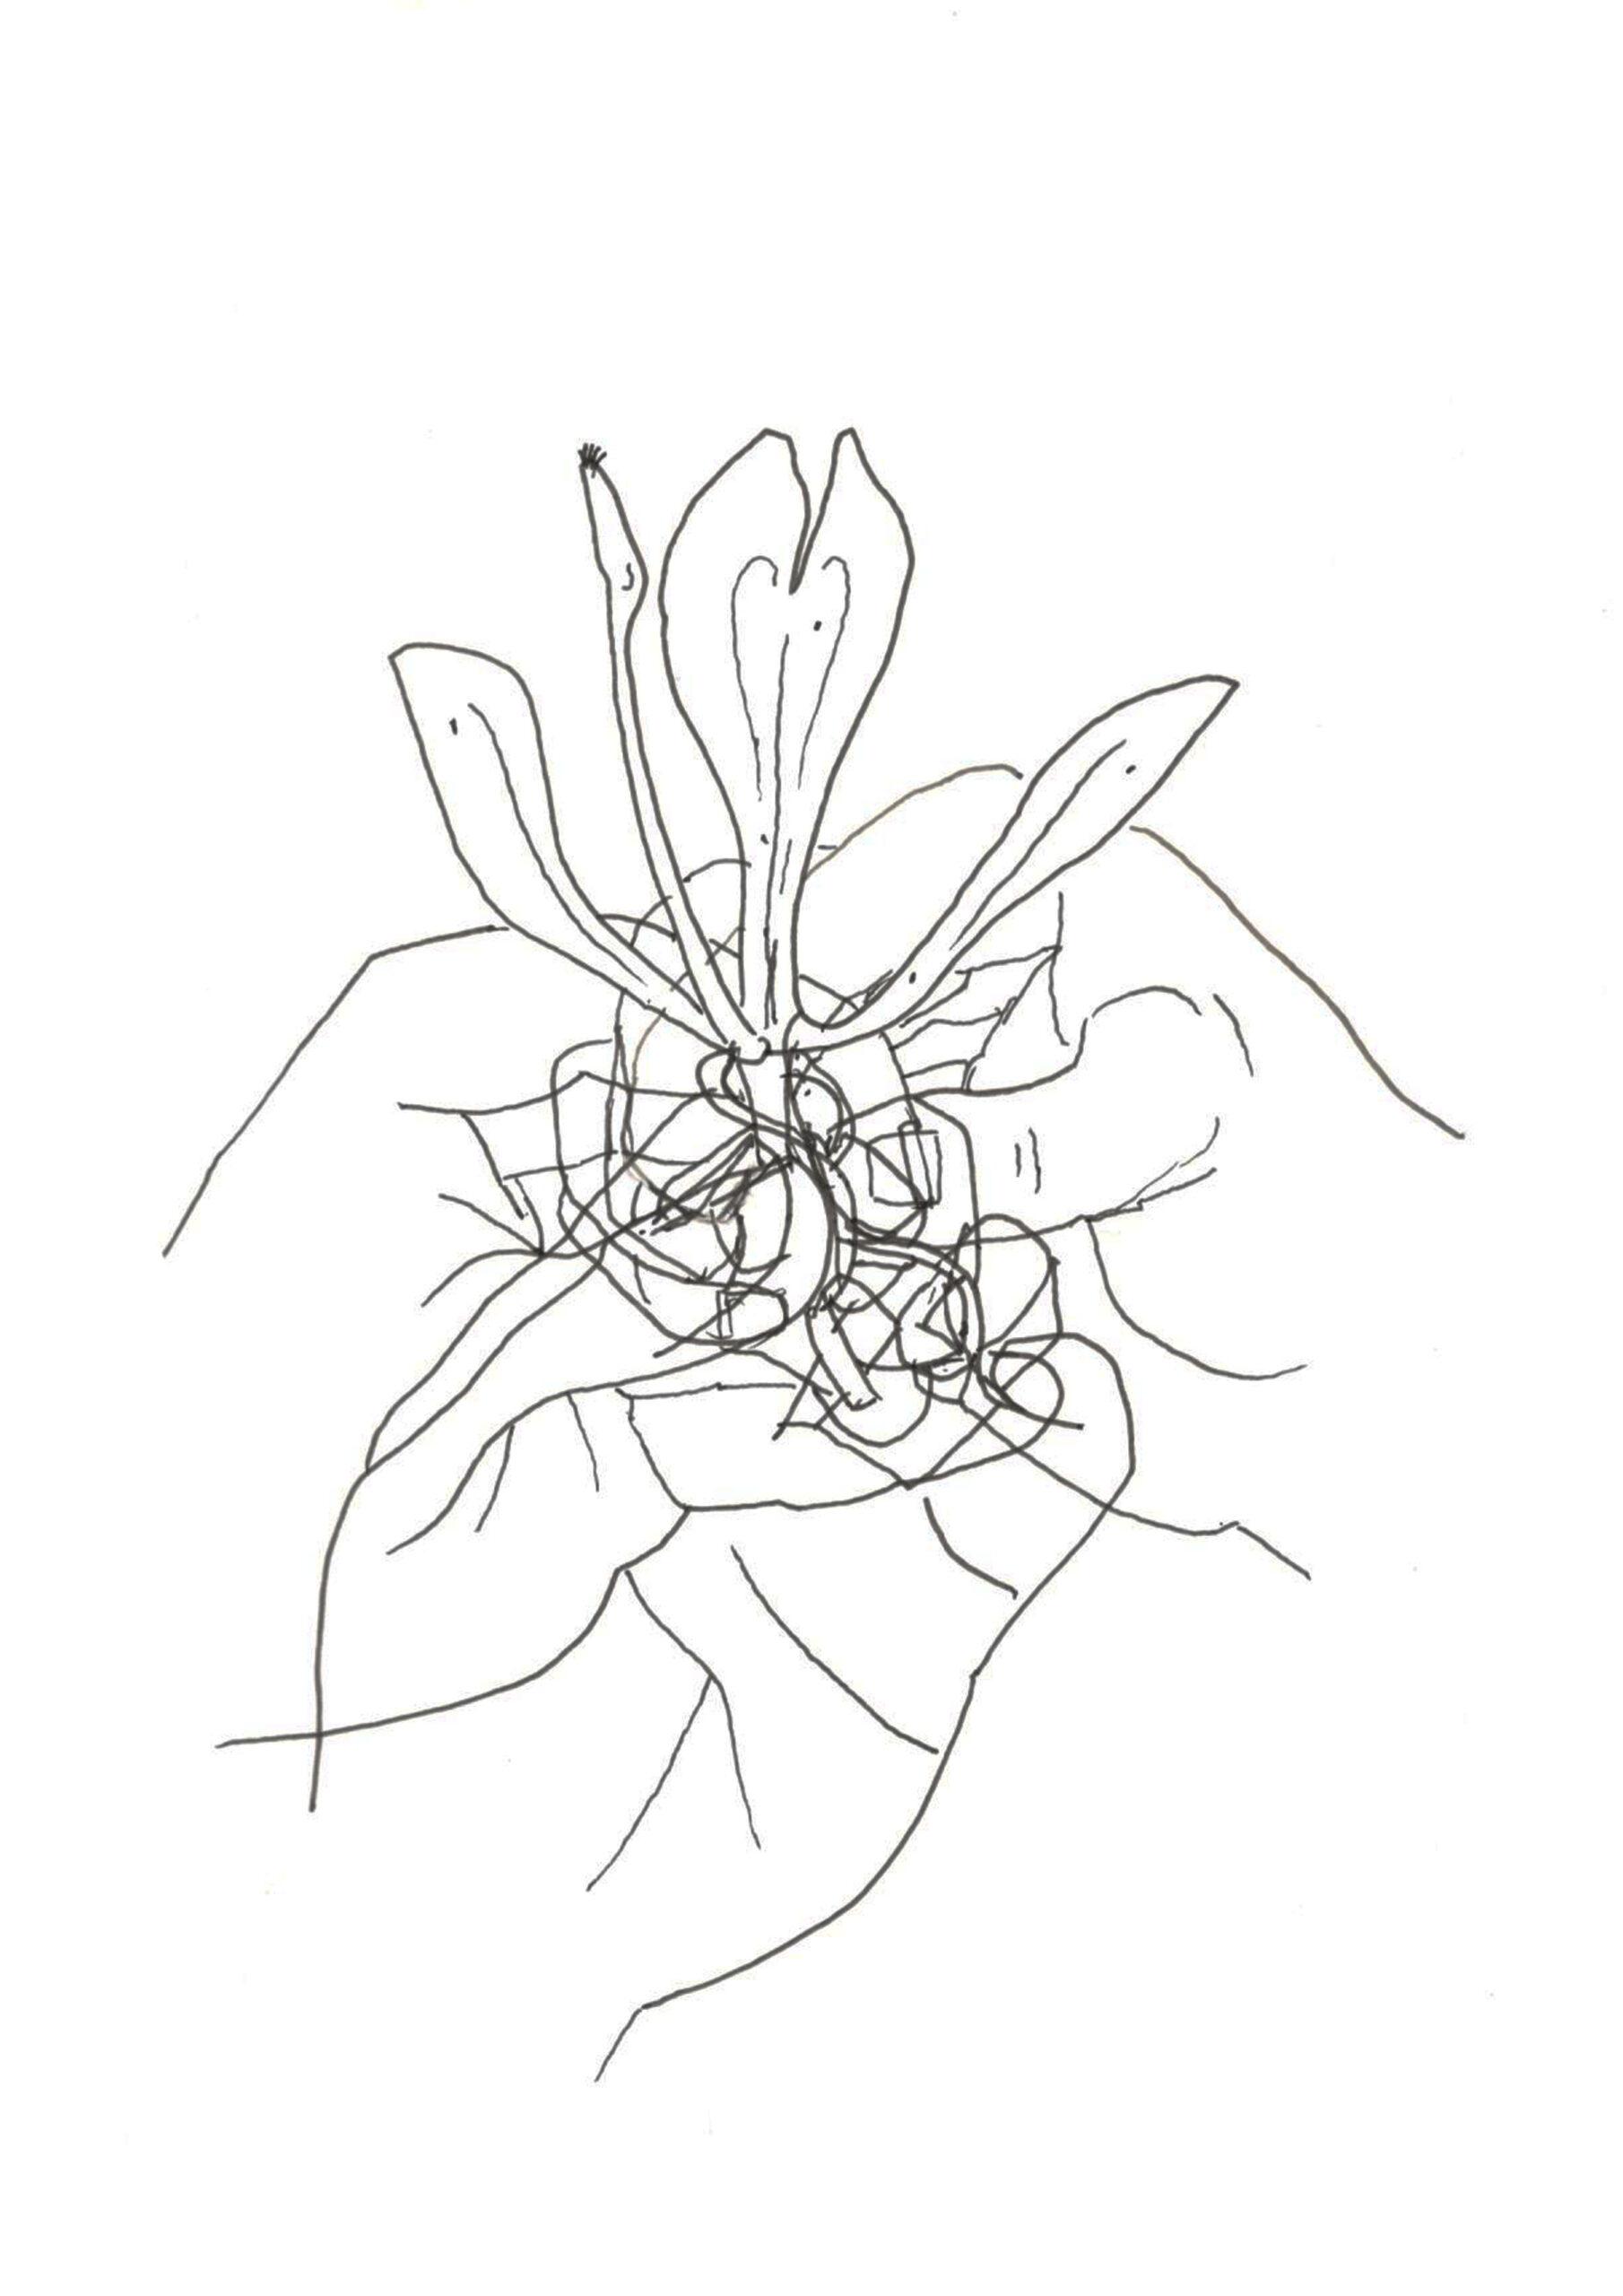 Hand_website_illustrations_5